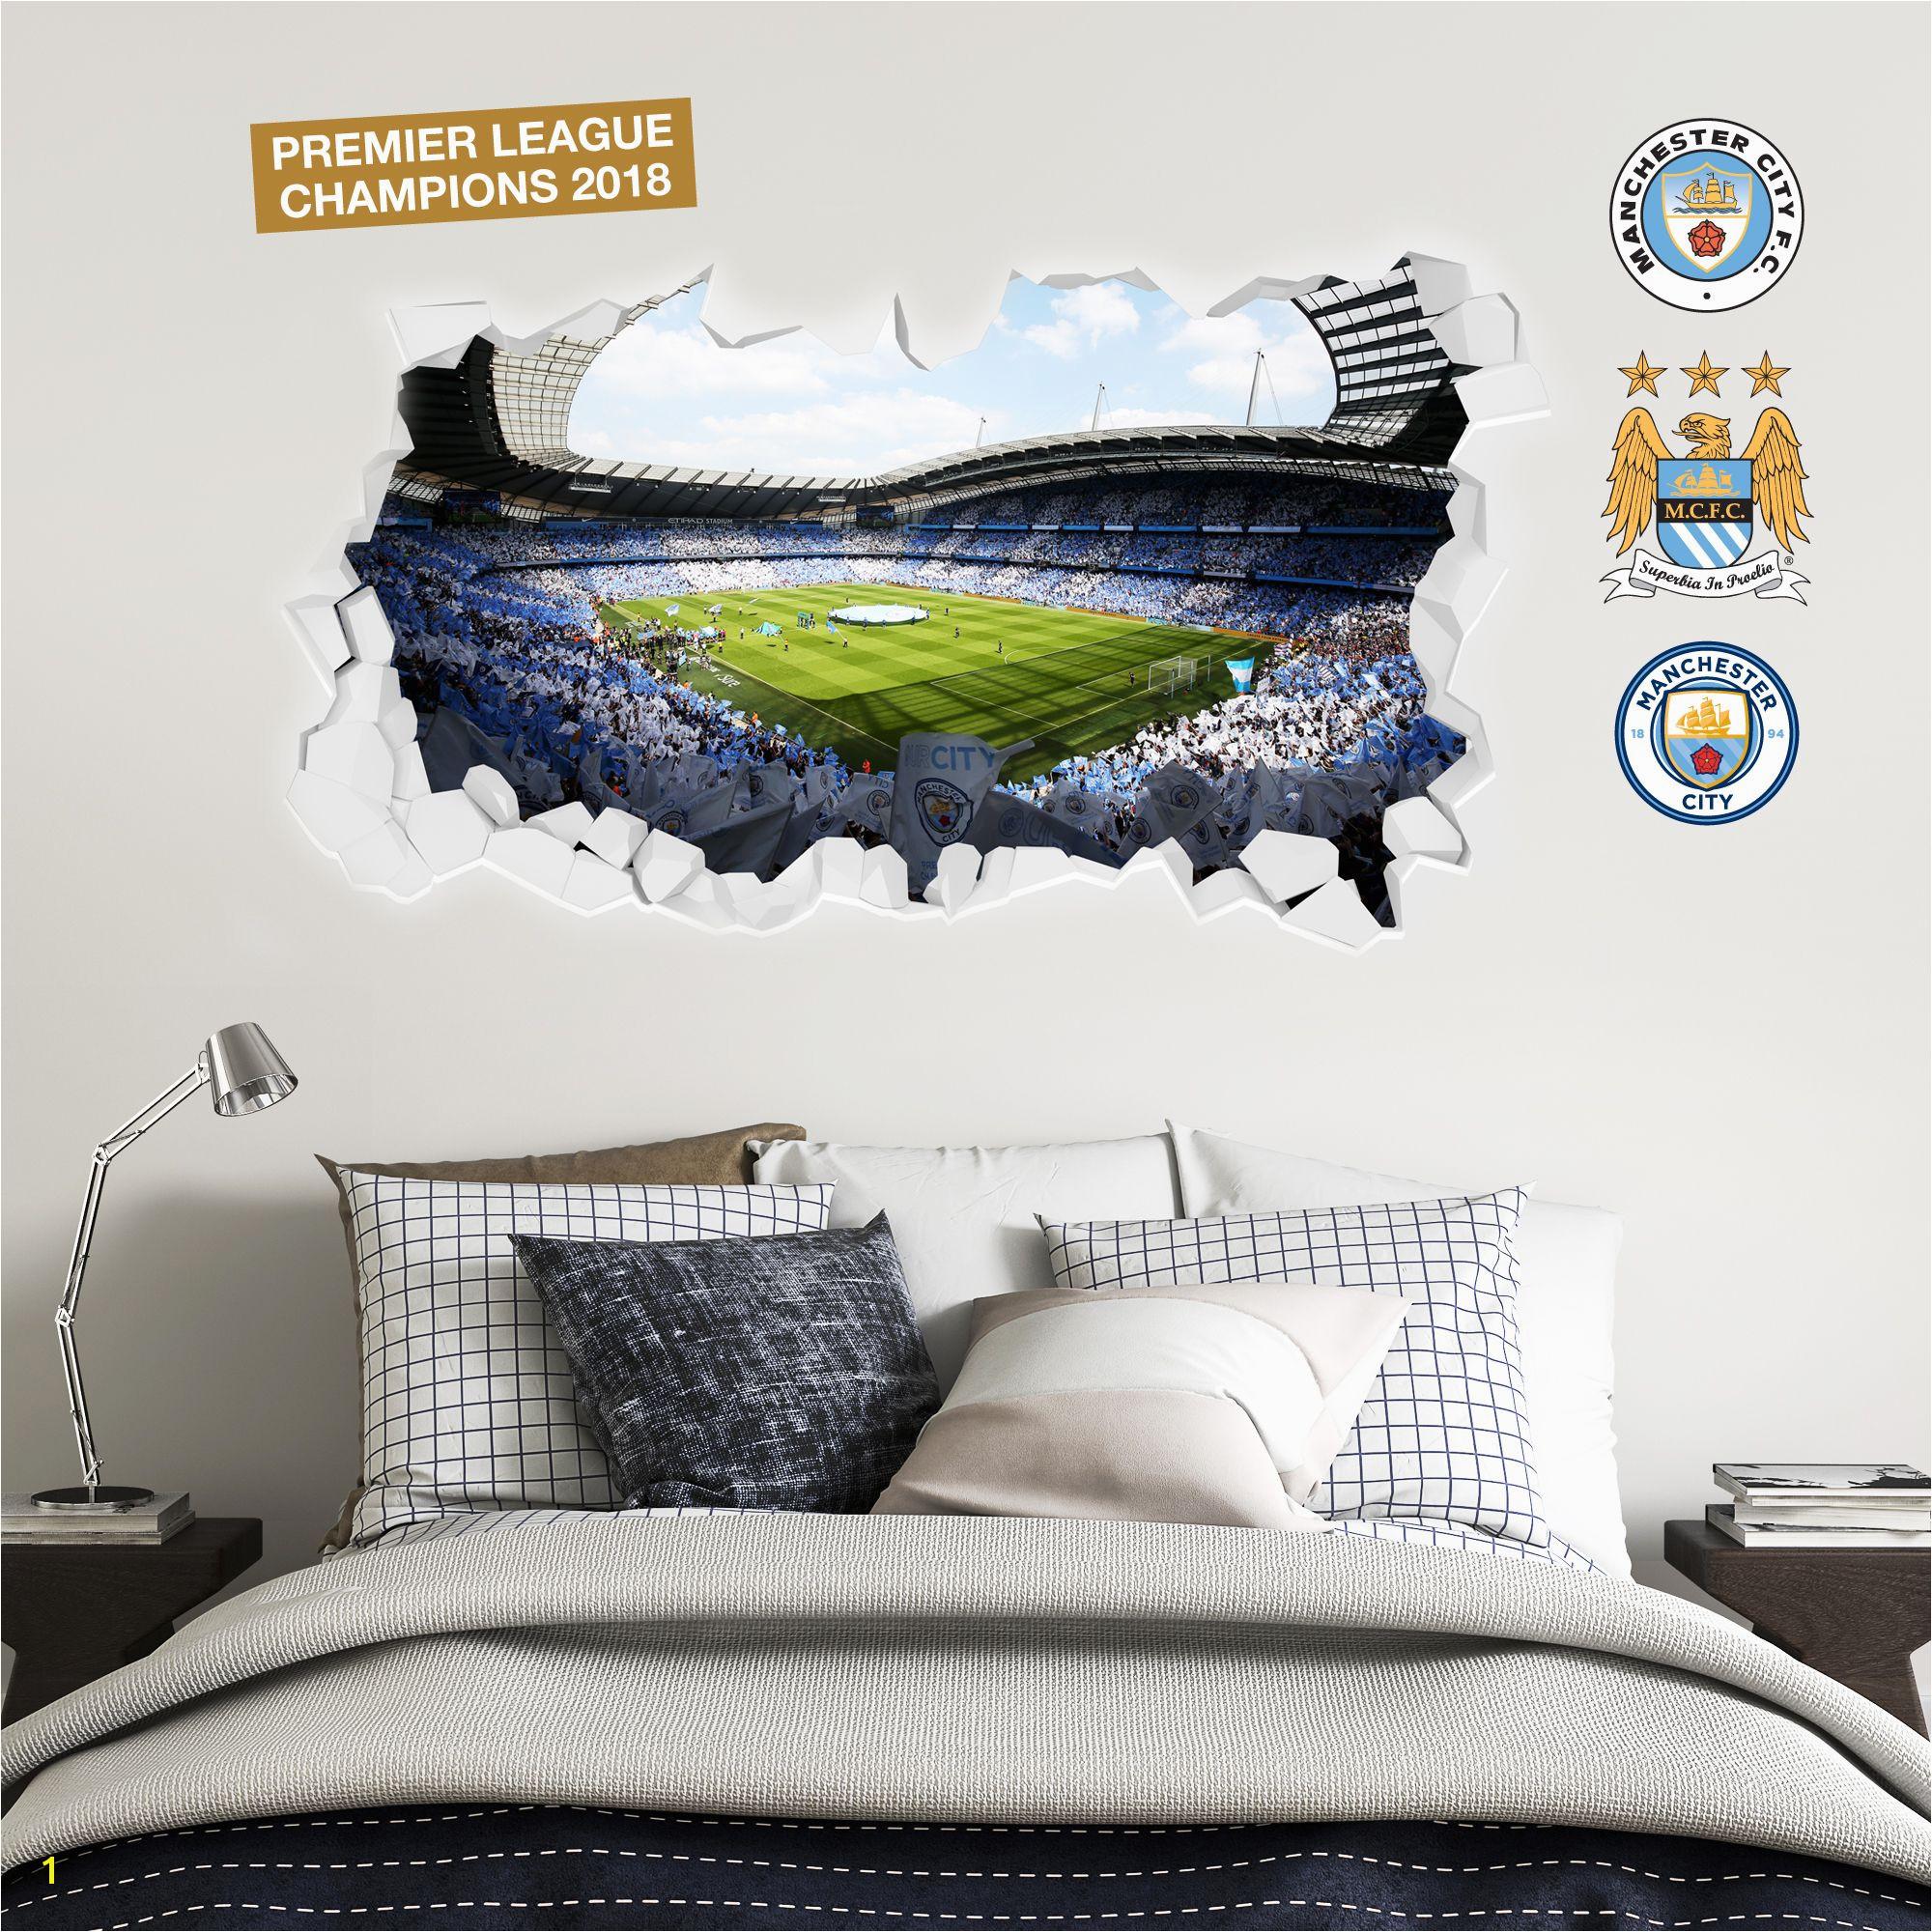 Champions Etihad Smashed Wall Stadium Corner Shot Mural Manchester City FC Wall Mural & MCFC